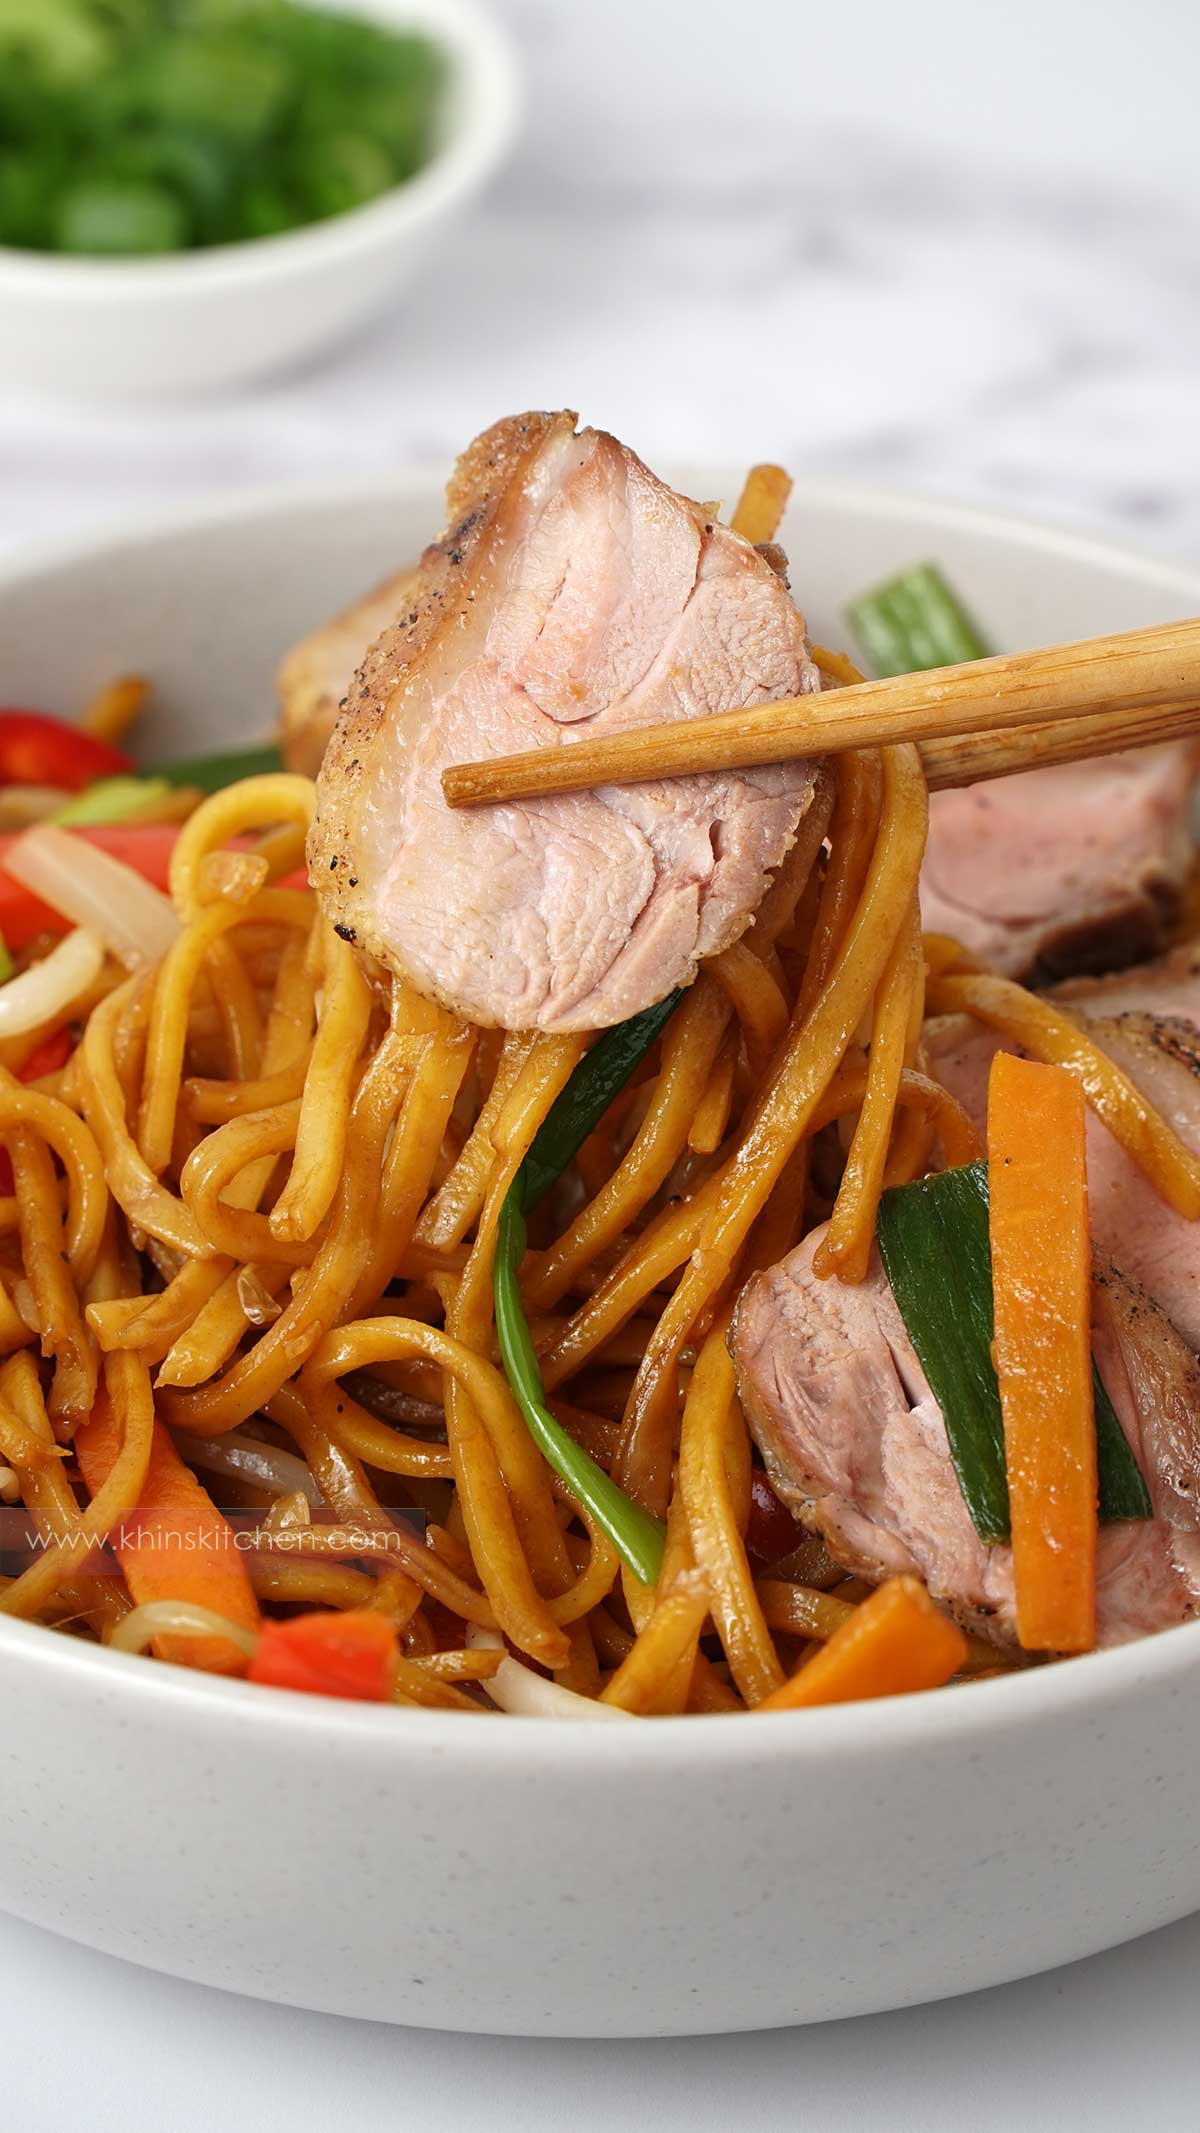 Chopsticks picking up duck and stir fried noodles.